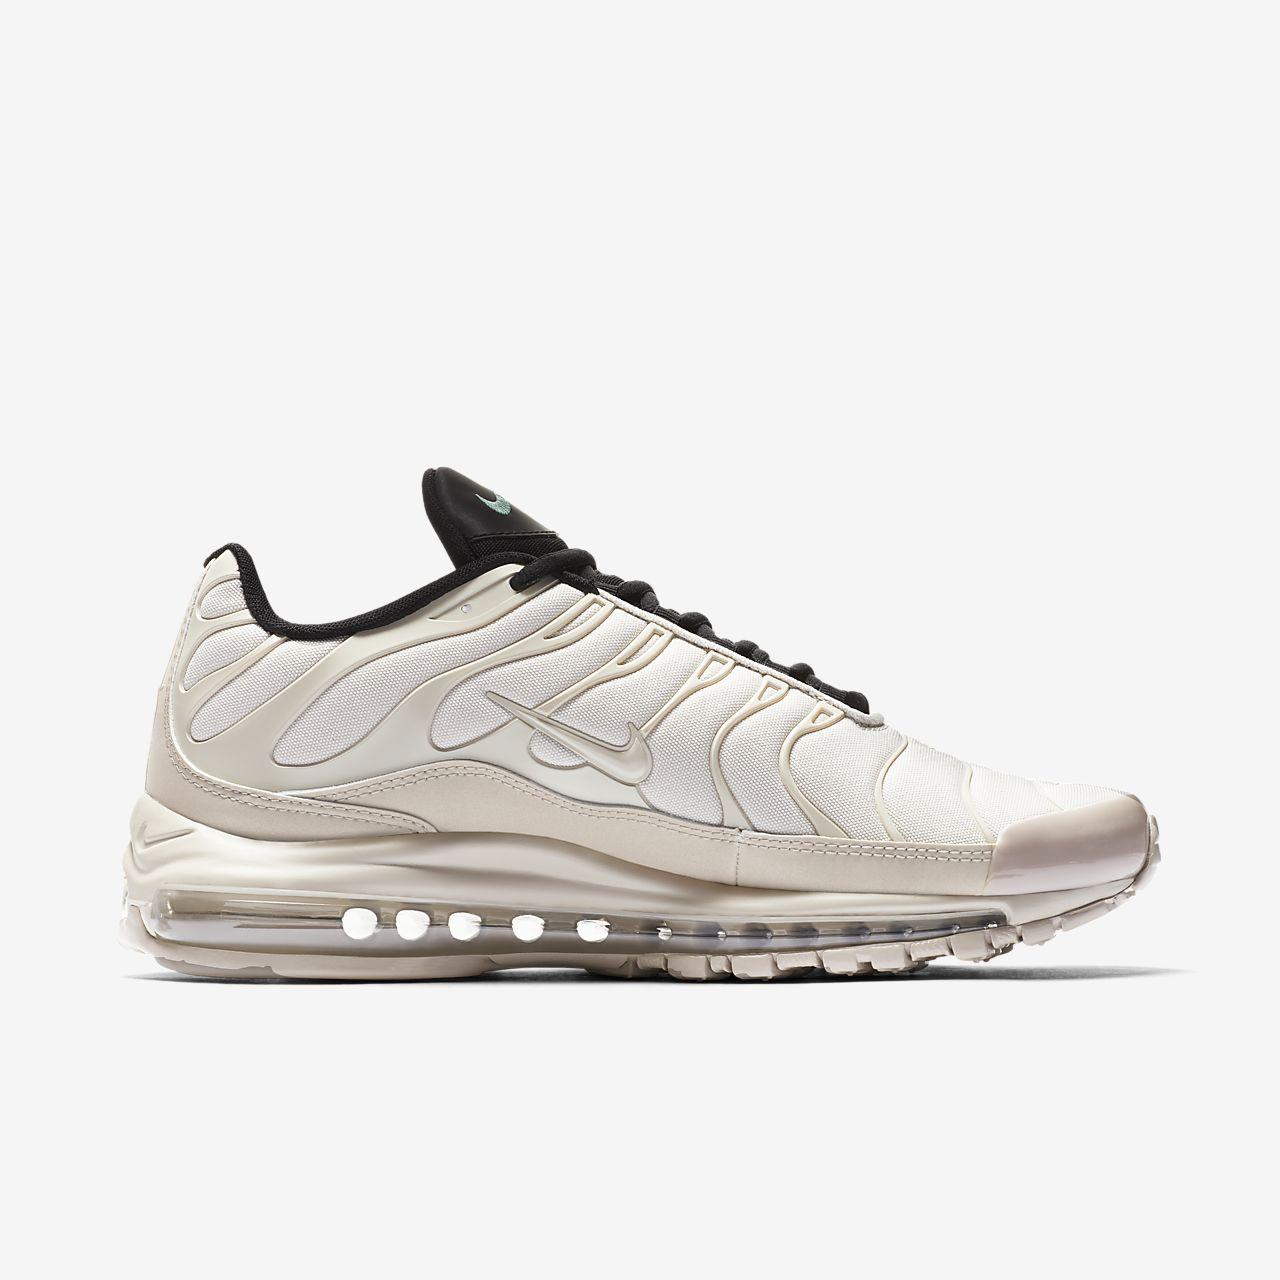 2b22d2f3c64b6e Nike Air Max 97 Plus Men s Shoe. Nike.com GB